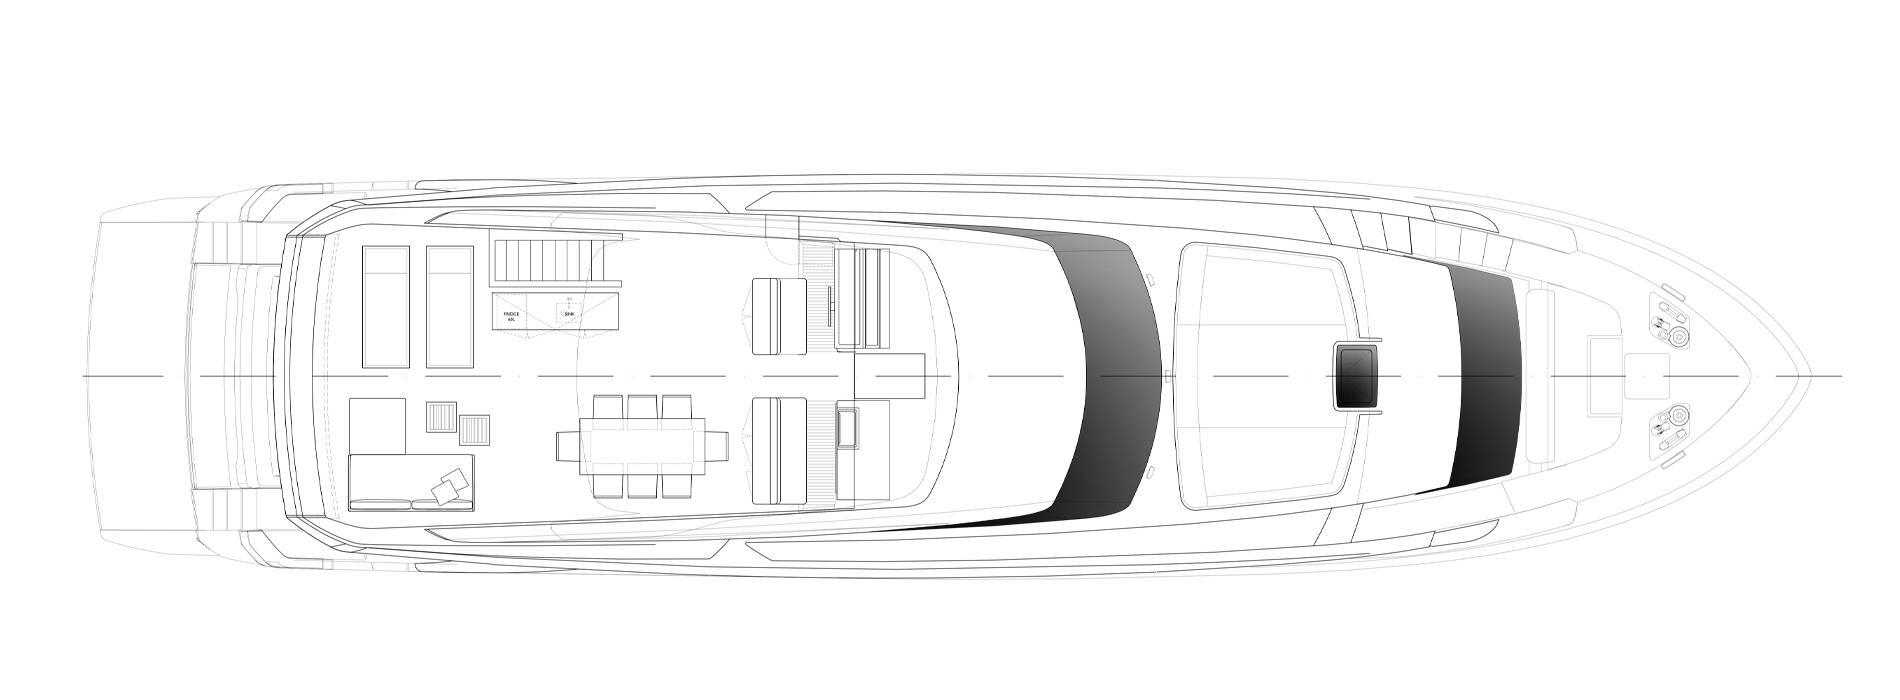 Sanlorenzo Yachts SL90 Asymmetric Flying bridge